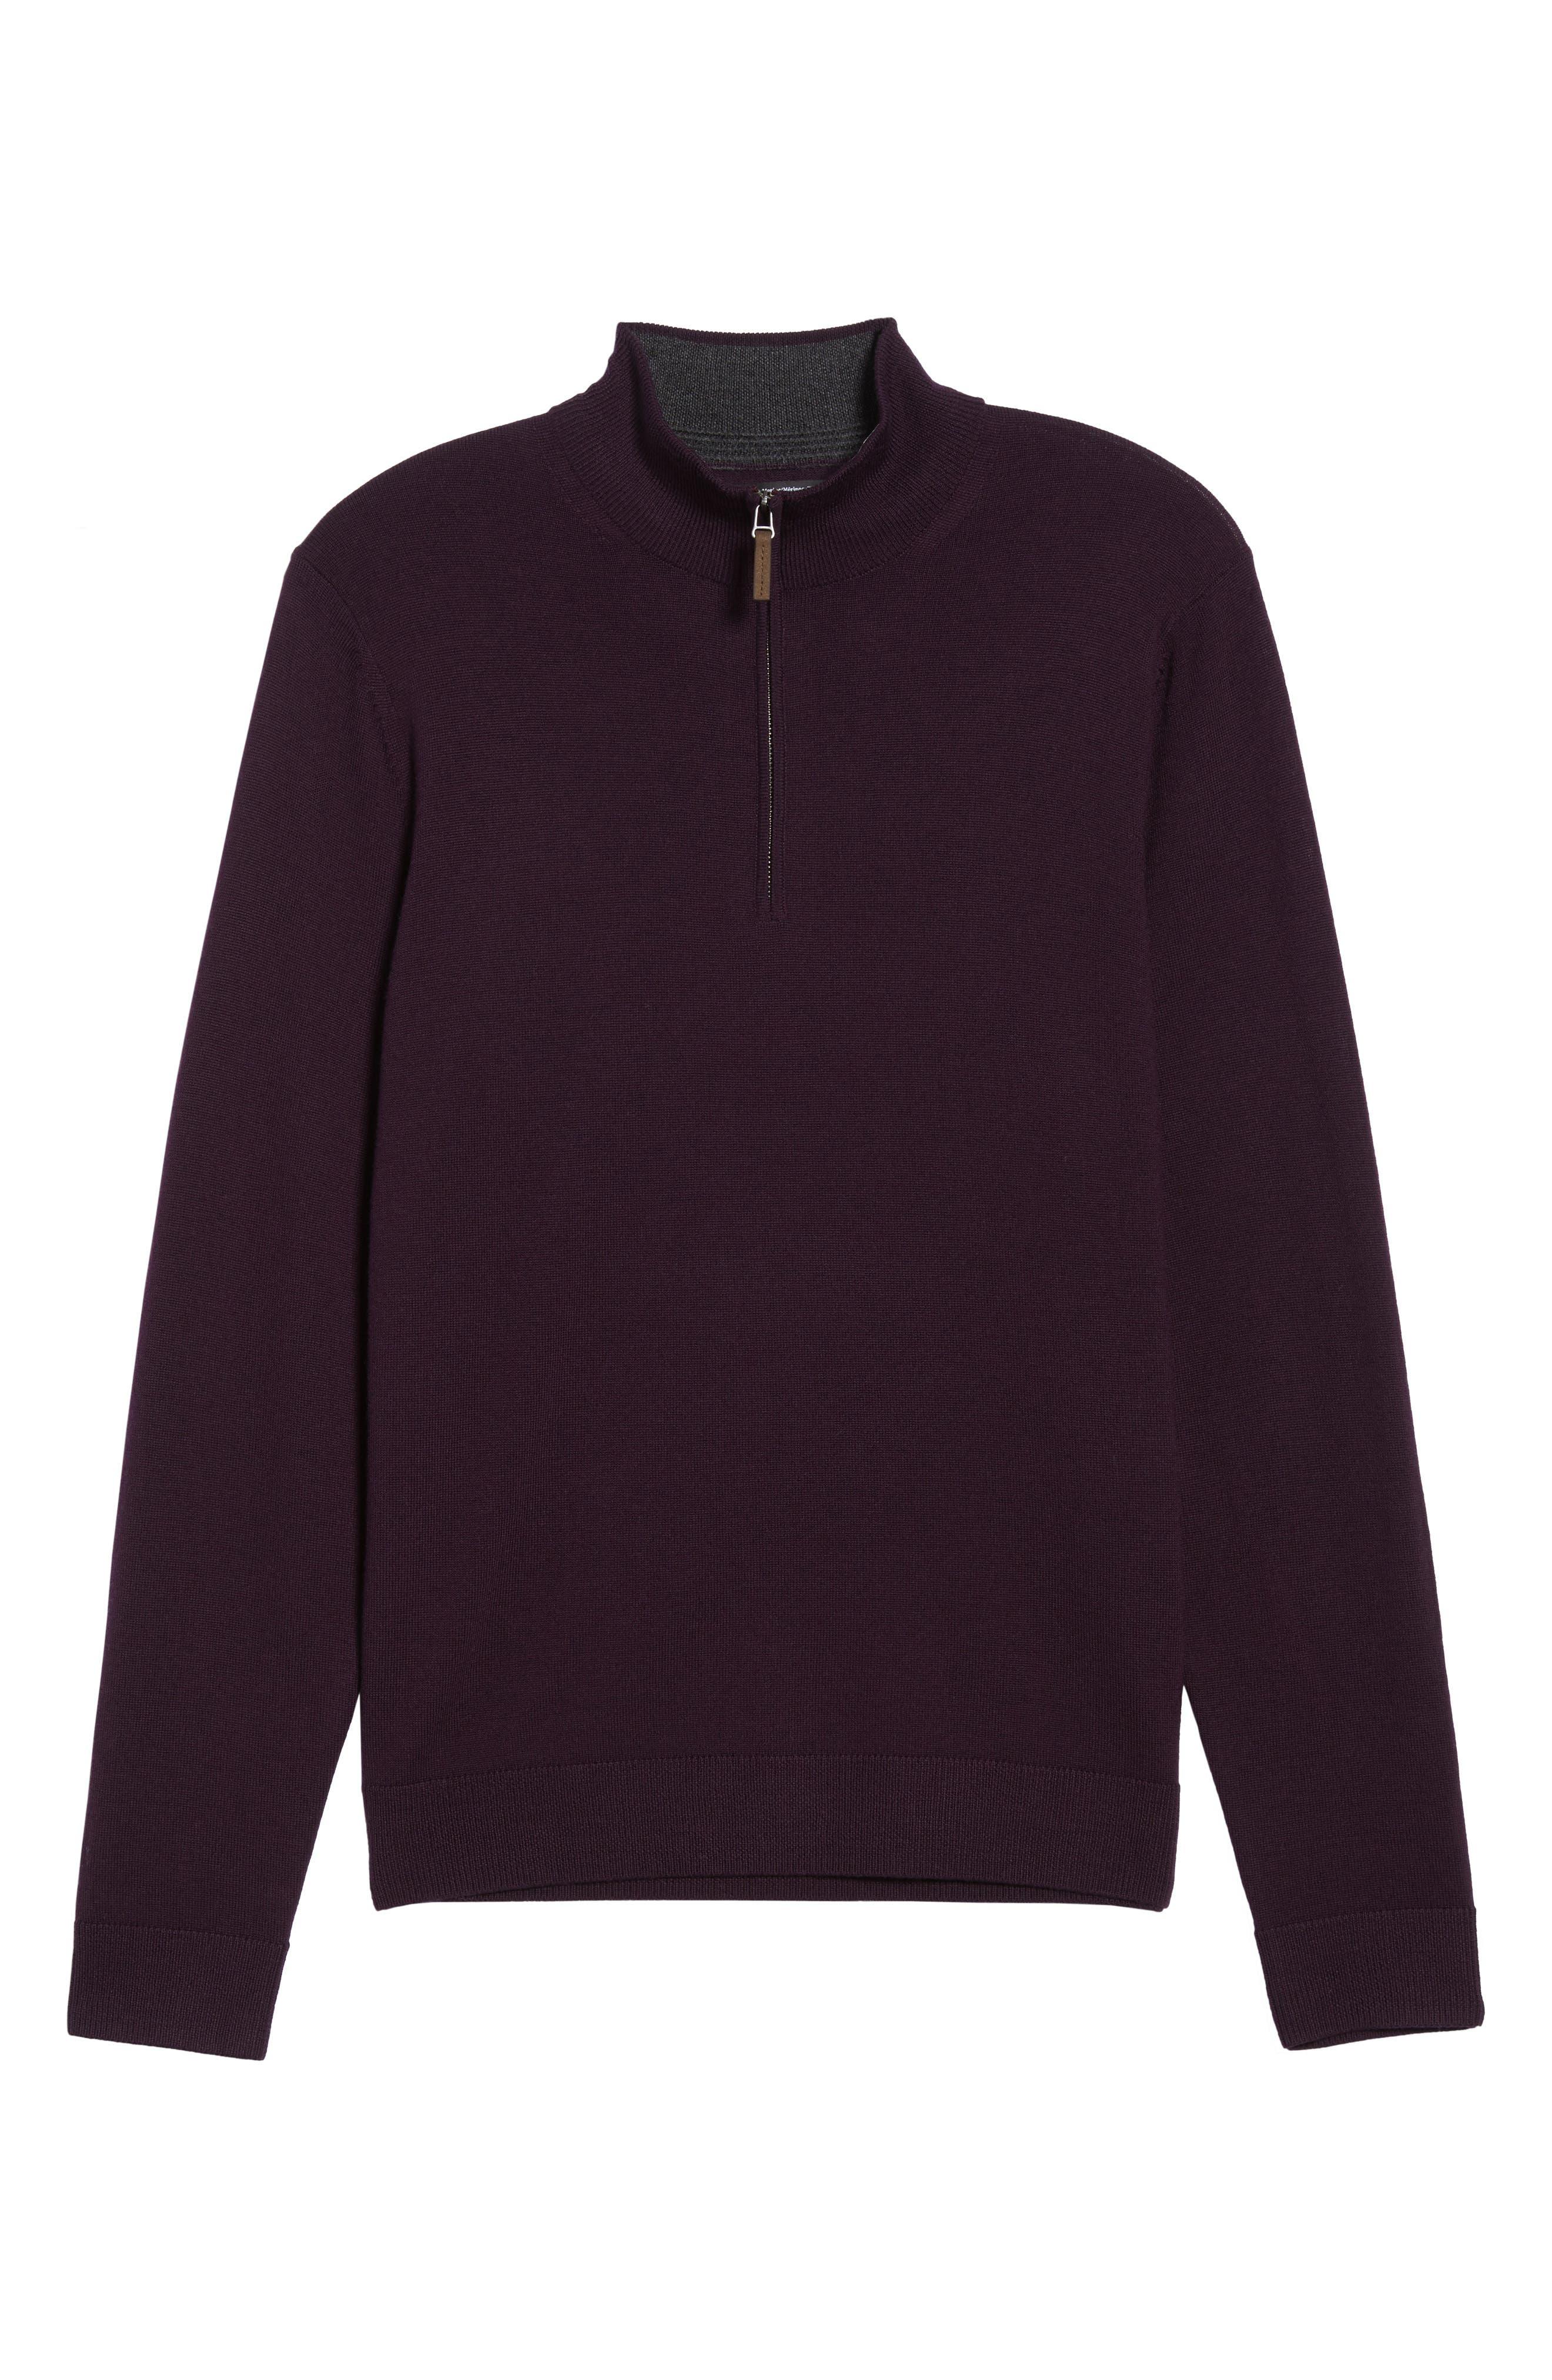 Quarter Zip Wool Pullover,                             Alternate thumbnail 6, color,                             Purple Plum